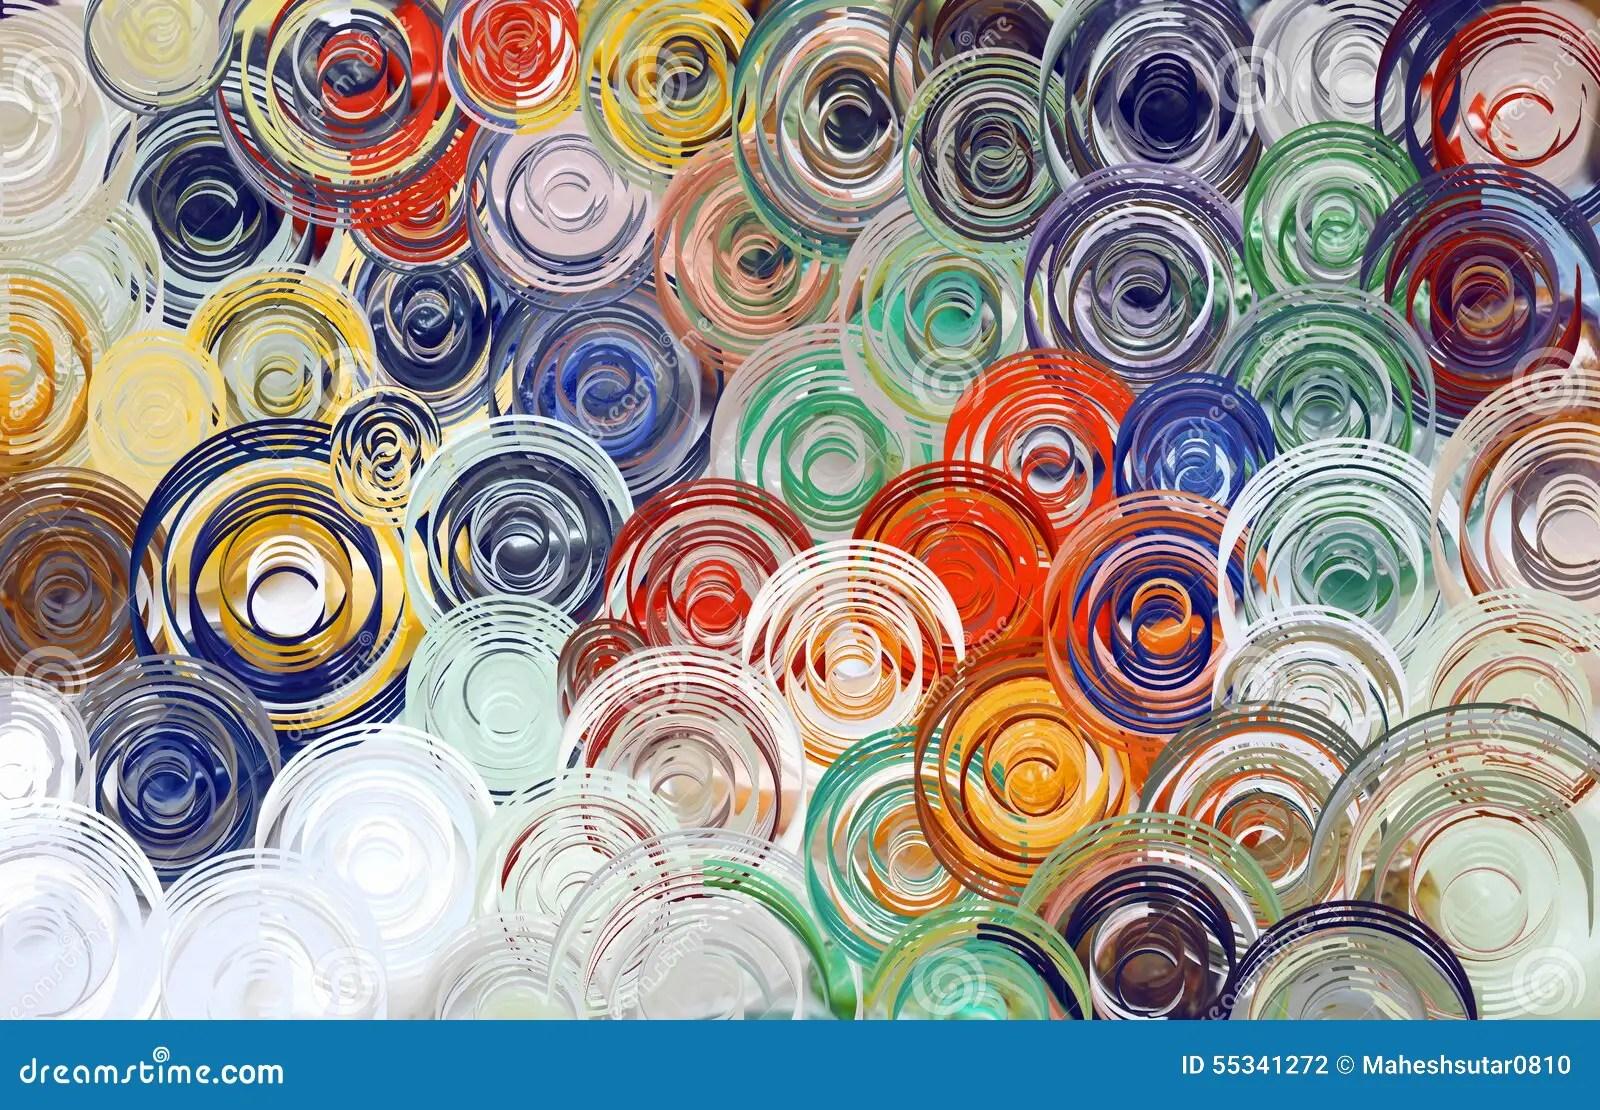 Colorful 3d Abstract Wallpapers 抽象派漩涡五颜六色的背景 Amp 墙纸 库存照片 图片 包括有 概念 黑暗 上色 数字式 分散 几何